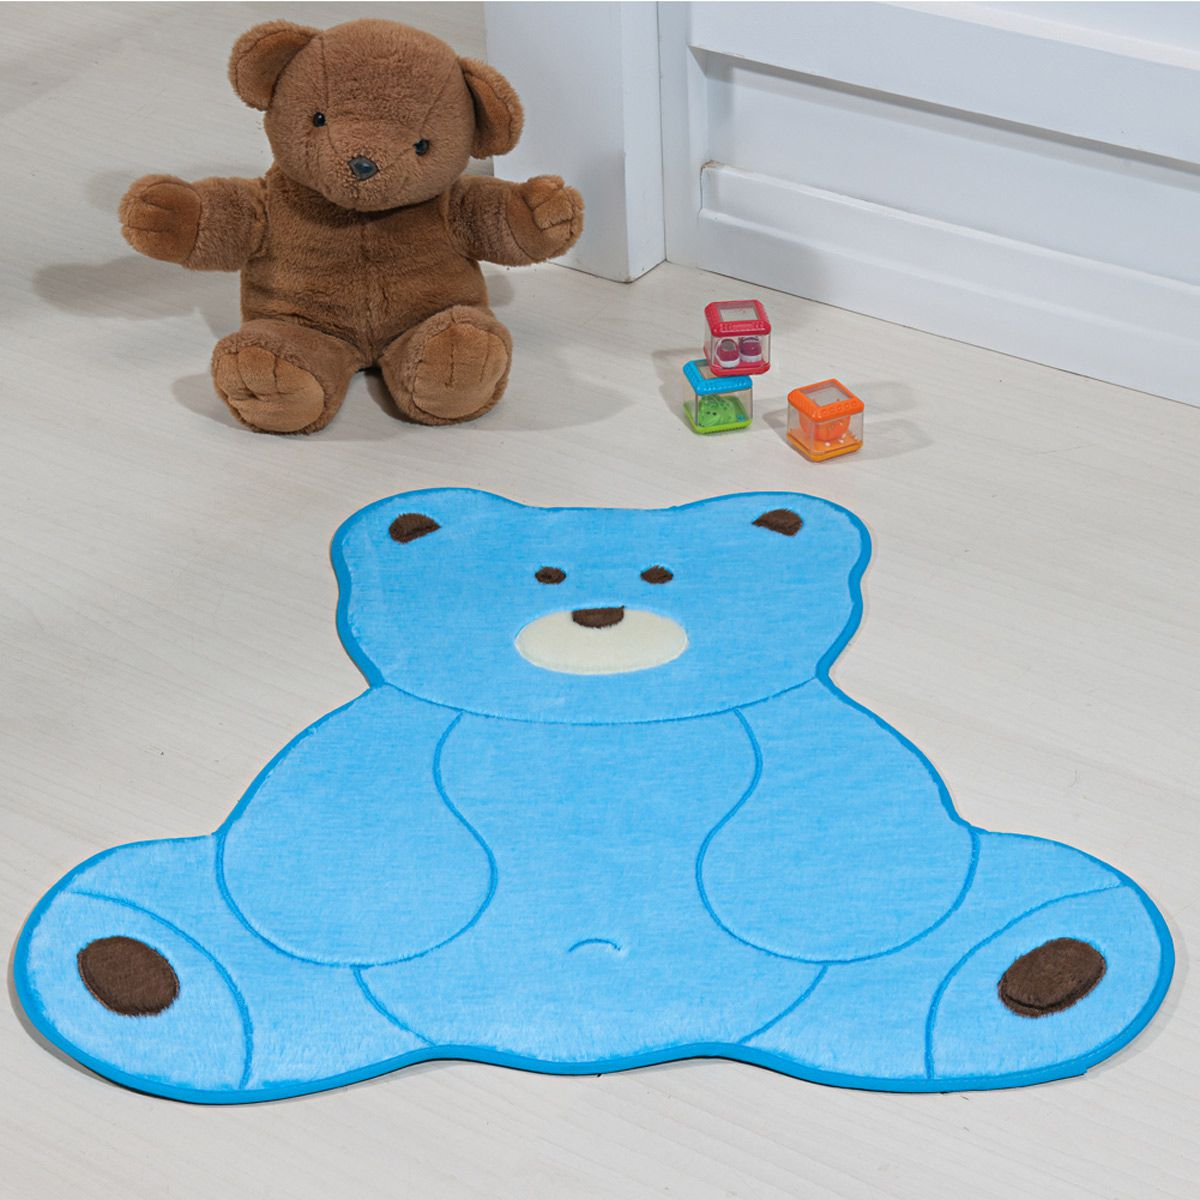 Tapete Infantil Premium Baby Formato Urso Fofo Azul Turquesa 74cm x 70cm